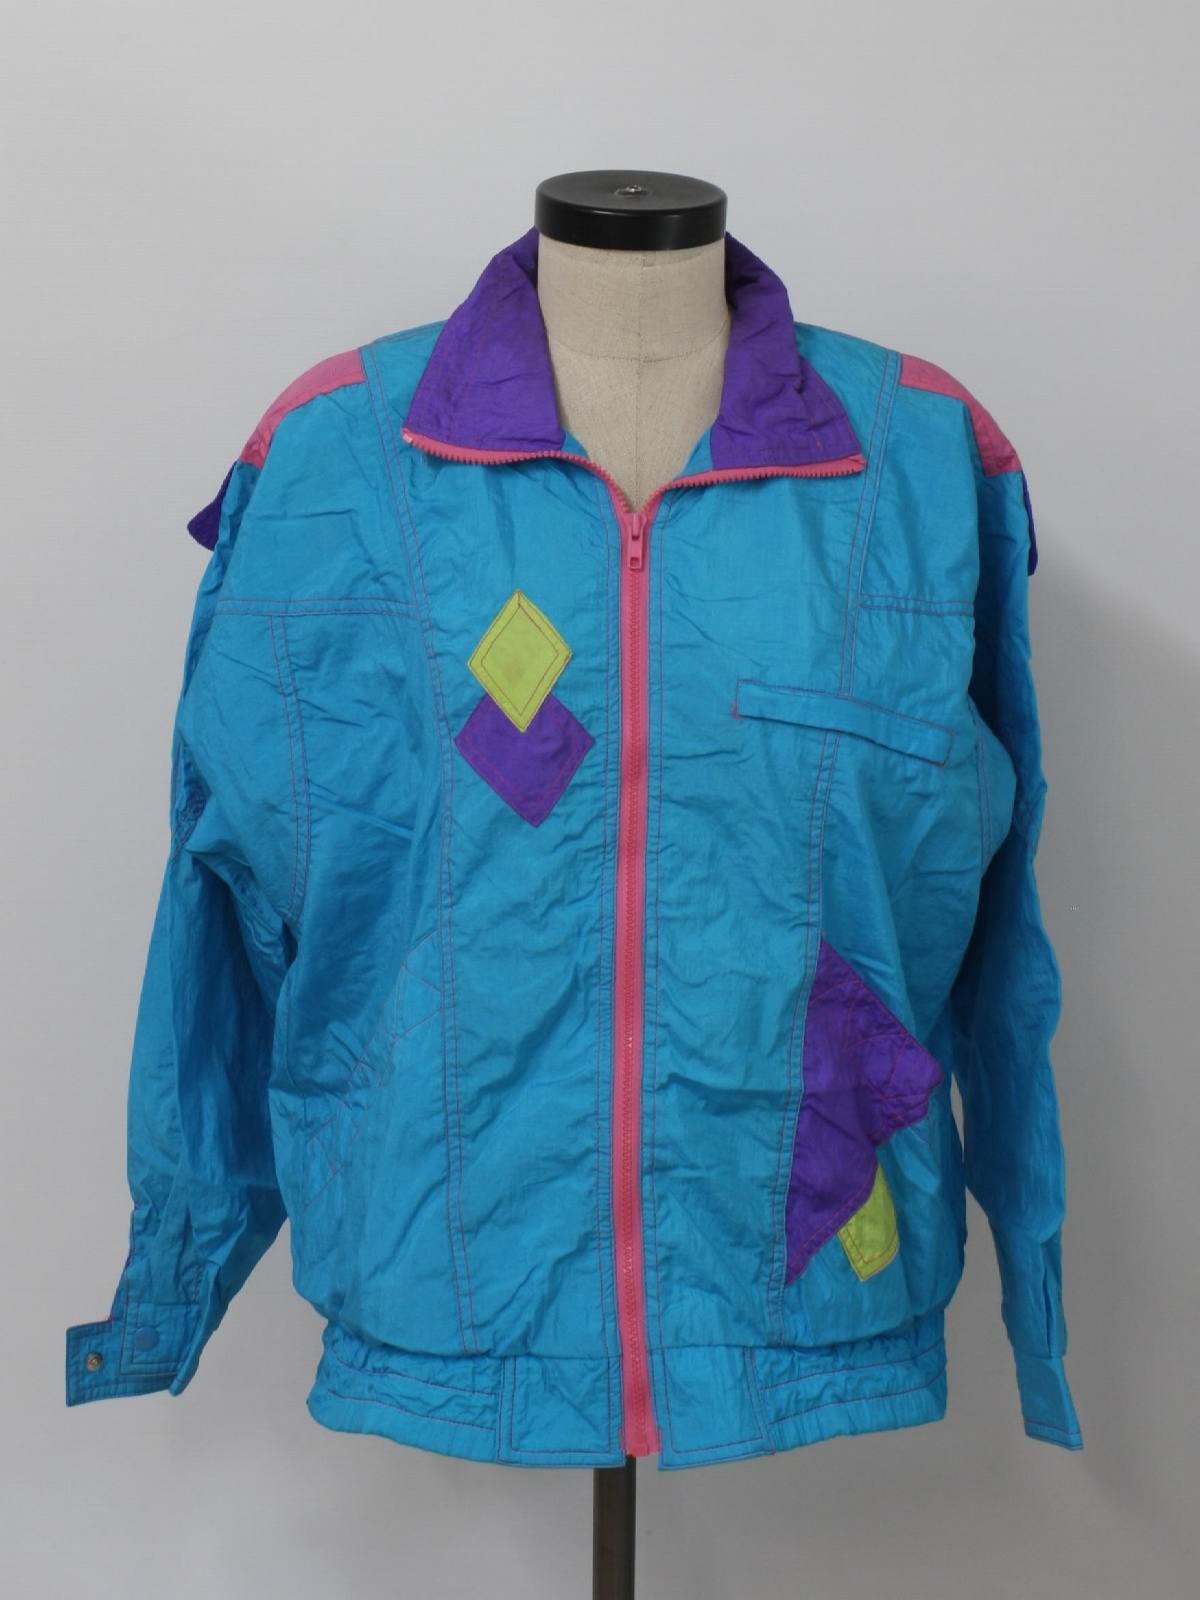 47a9a18db3f Retro 1980s Jacket  80s -Fashion Crossroads- Womens teal blue ...